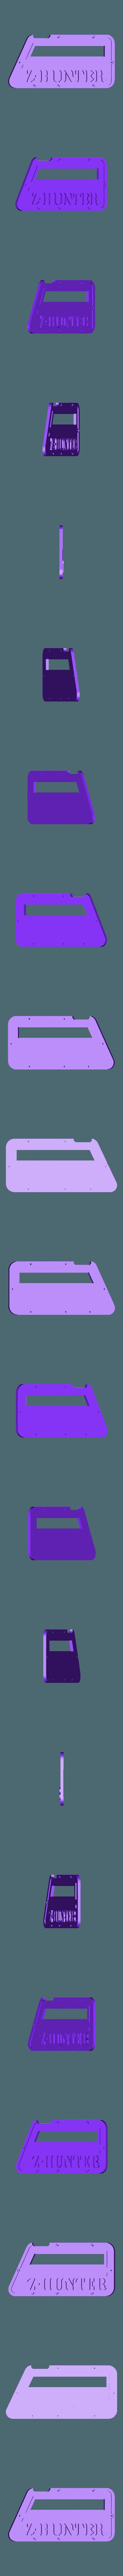 VITRES AV GAUCHE.stl Download STL file Shields for Carisma LYNX (zombie hunter) • 3D printing design, RCGANG93